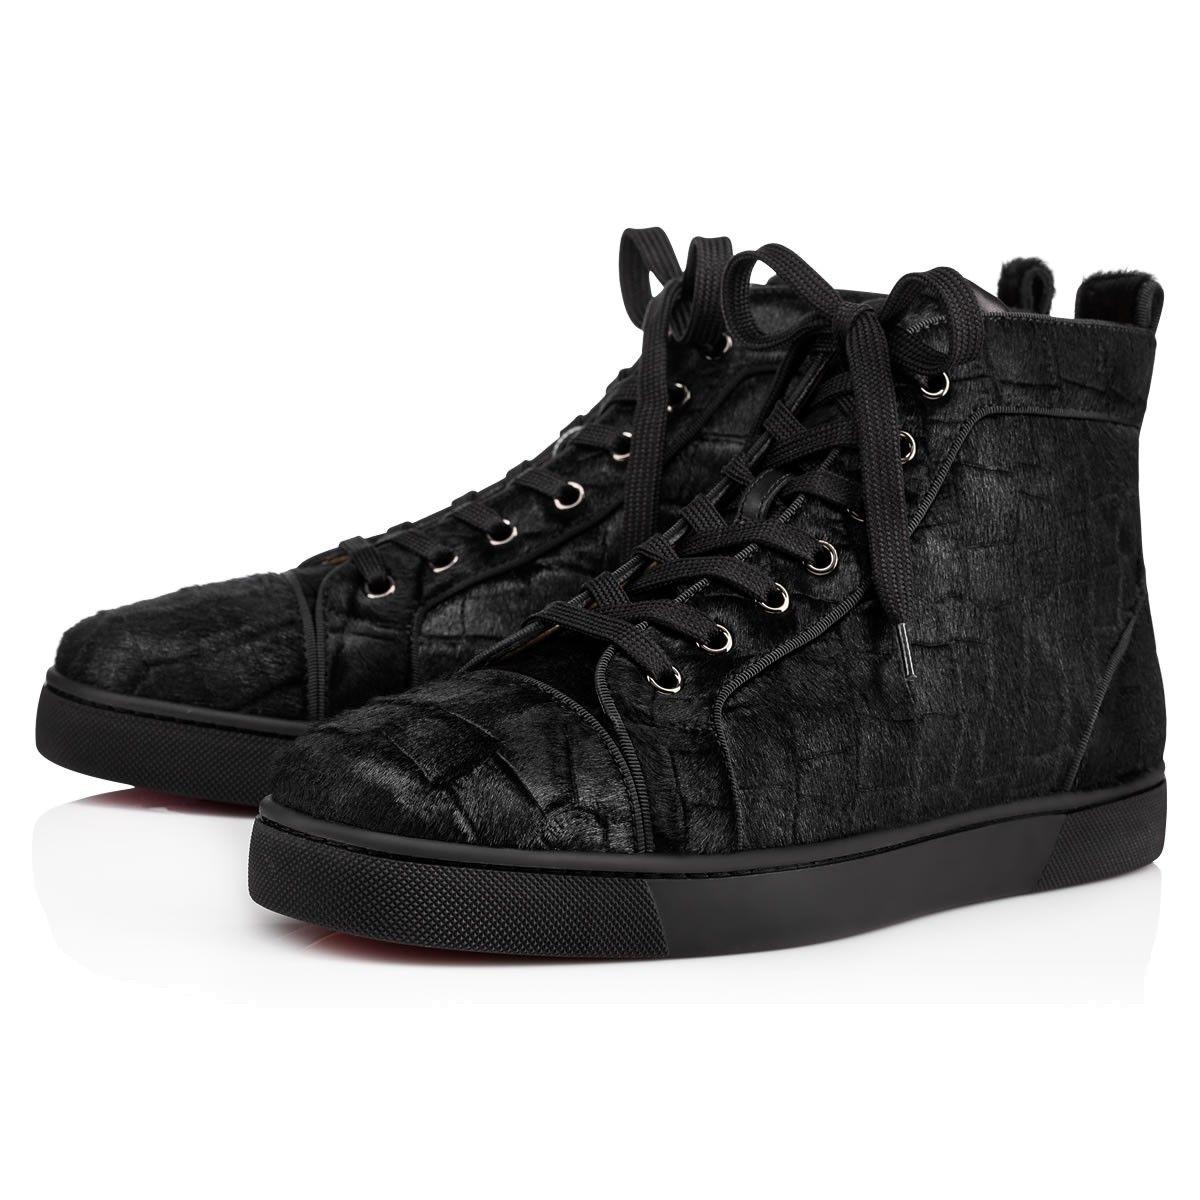 68ced44b7a0a CHRISTIAN LOUBOUTIN Louis Orlato Men S Flat Black Pony - Men Shoes - Christian  Louboutin.  christianlouboutin  shoes